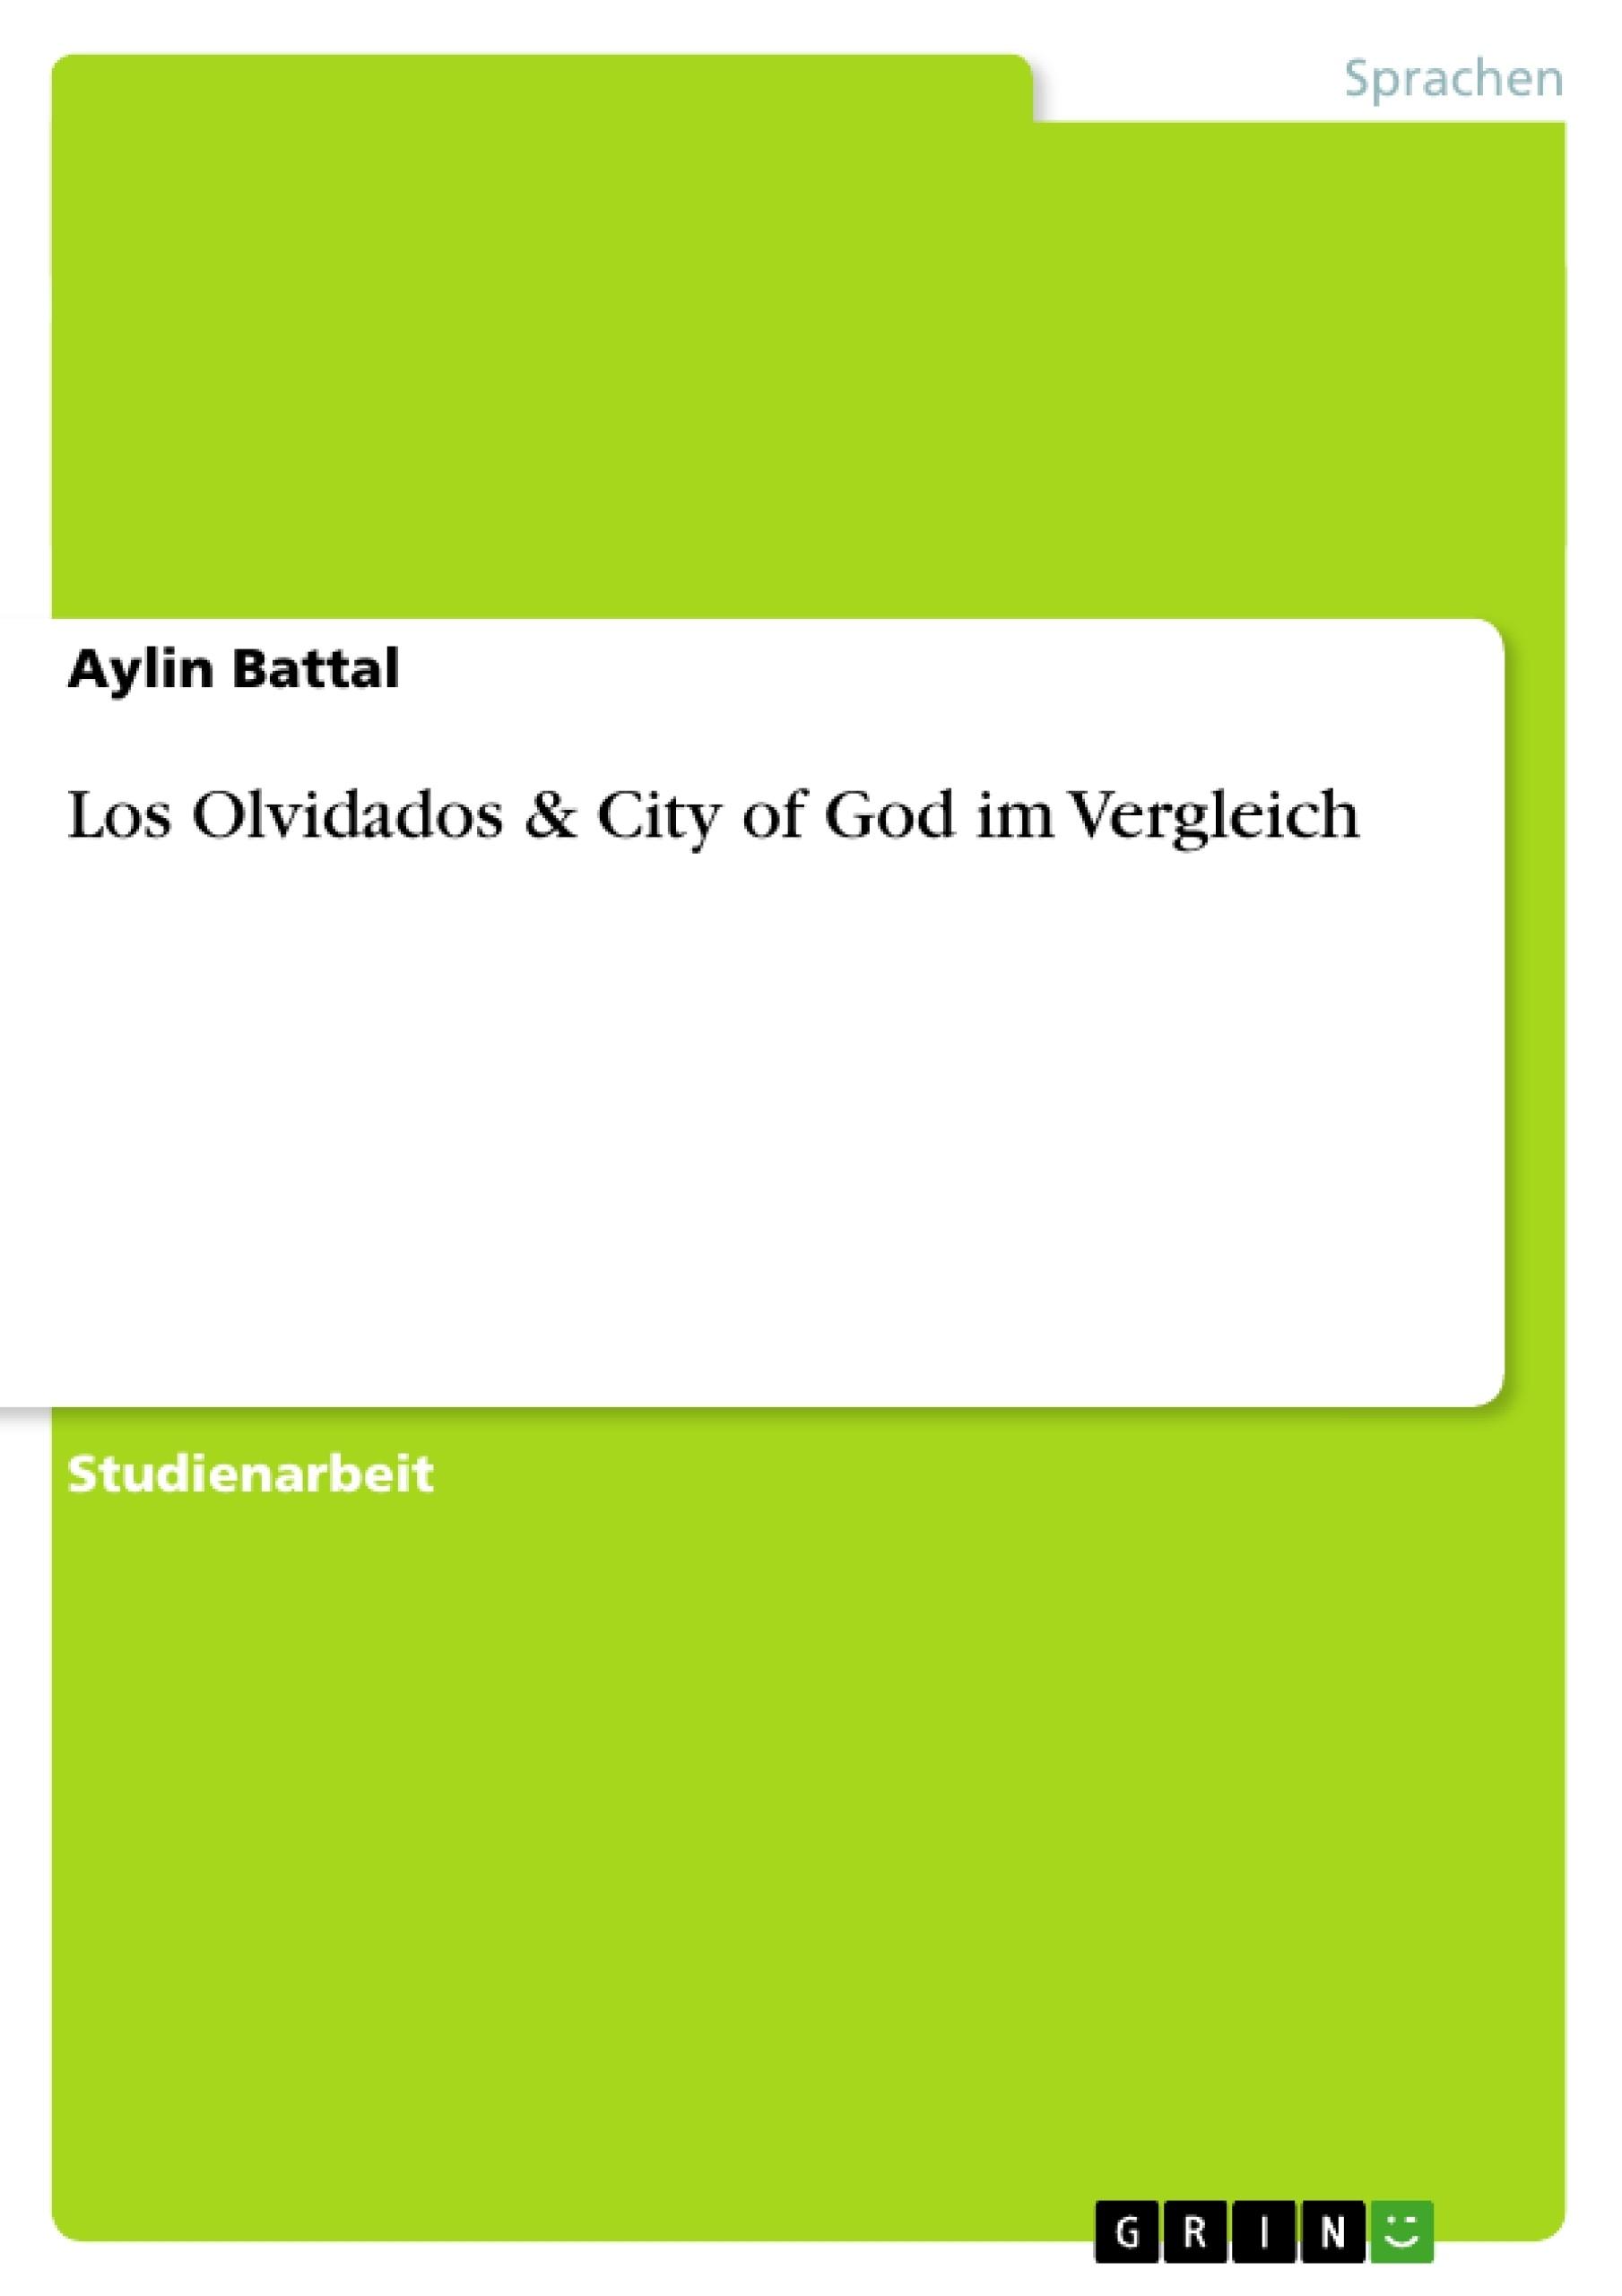 Titel: Los Olvidados & City of God im Vergleich